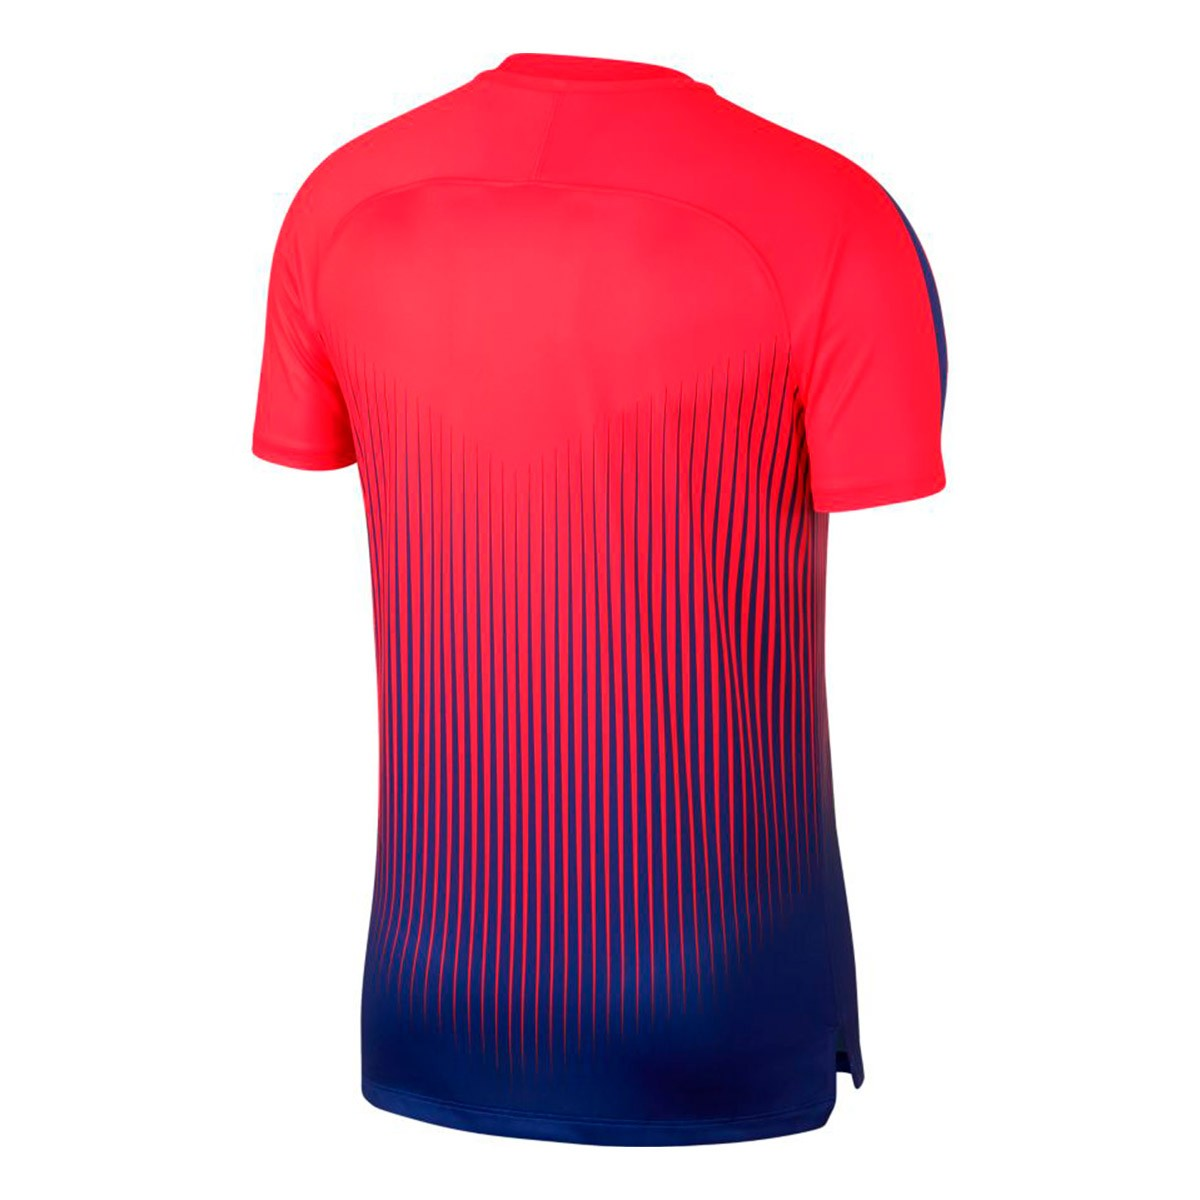 a08025eb8a Jersey Nike Atlético de Madrid Squad 2018-2019 Bright crimson-Deep ...